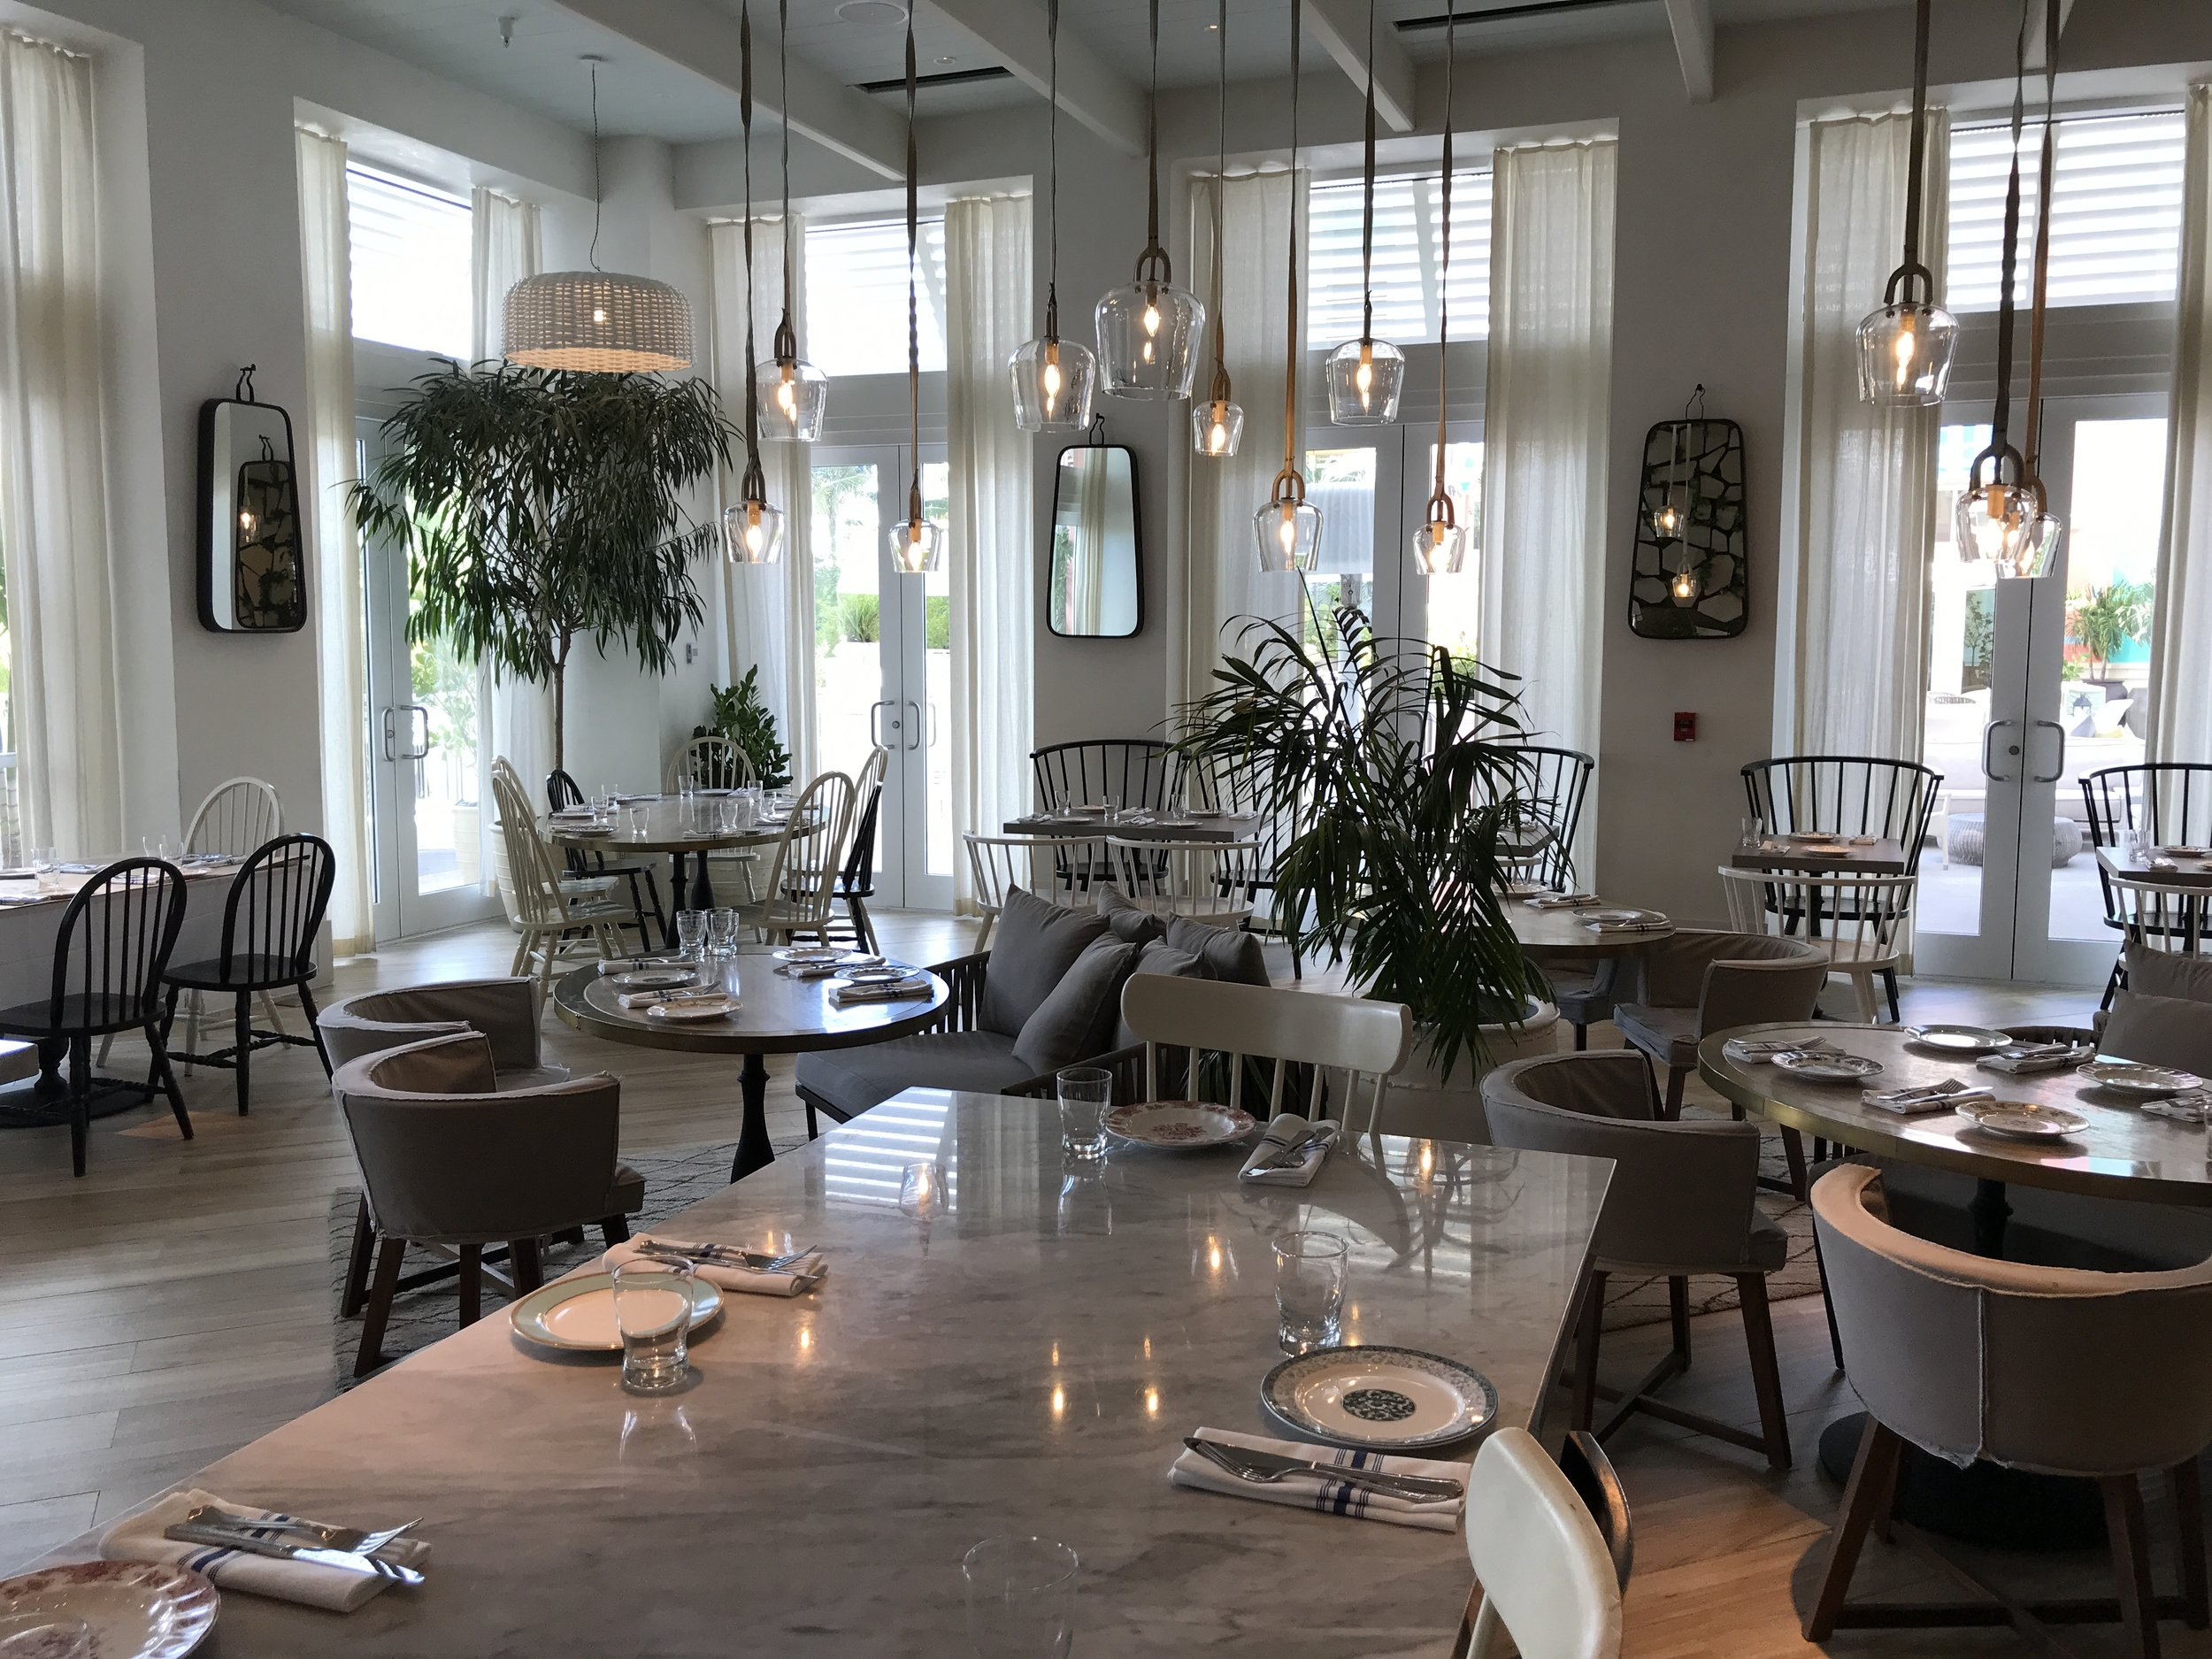 Cleo Restaurant_PDG_Tenant Improvement.JPG